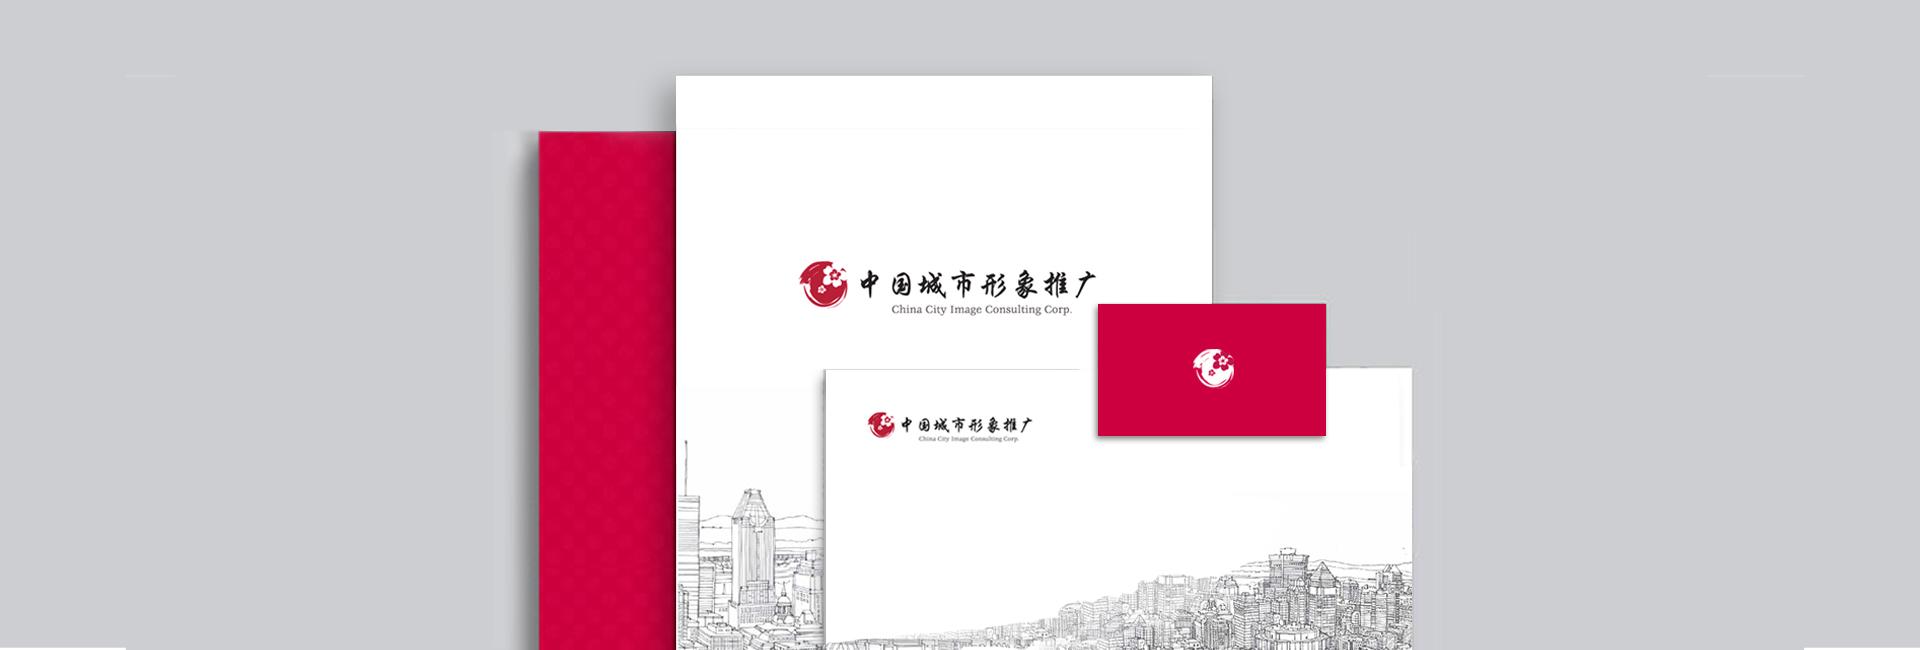 Branding – China City Image Consulting